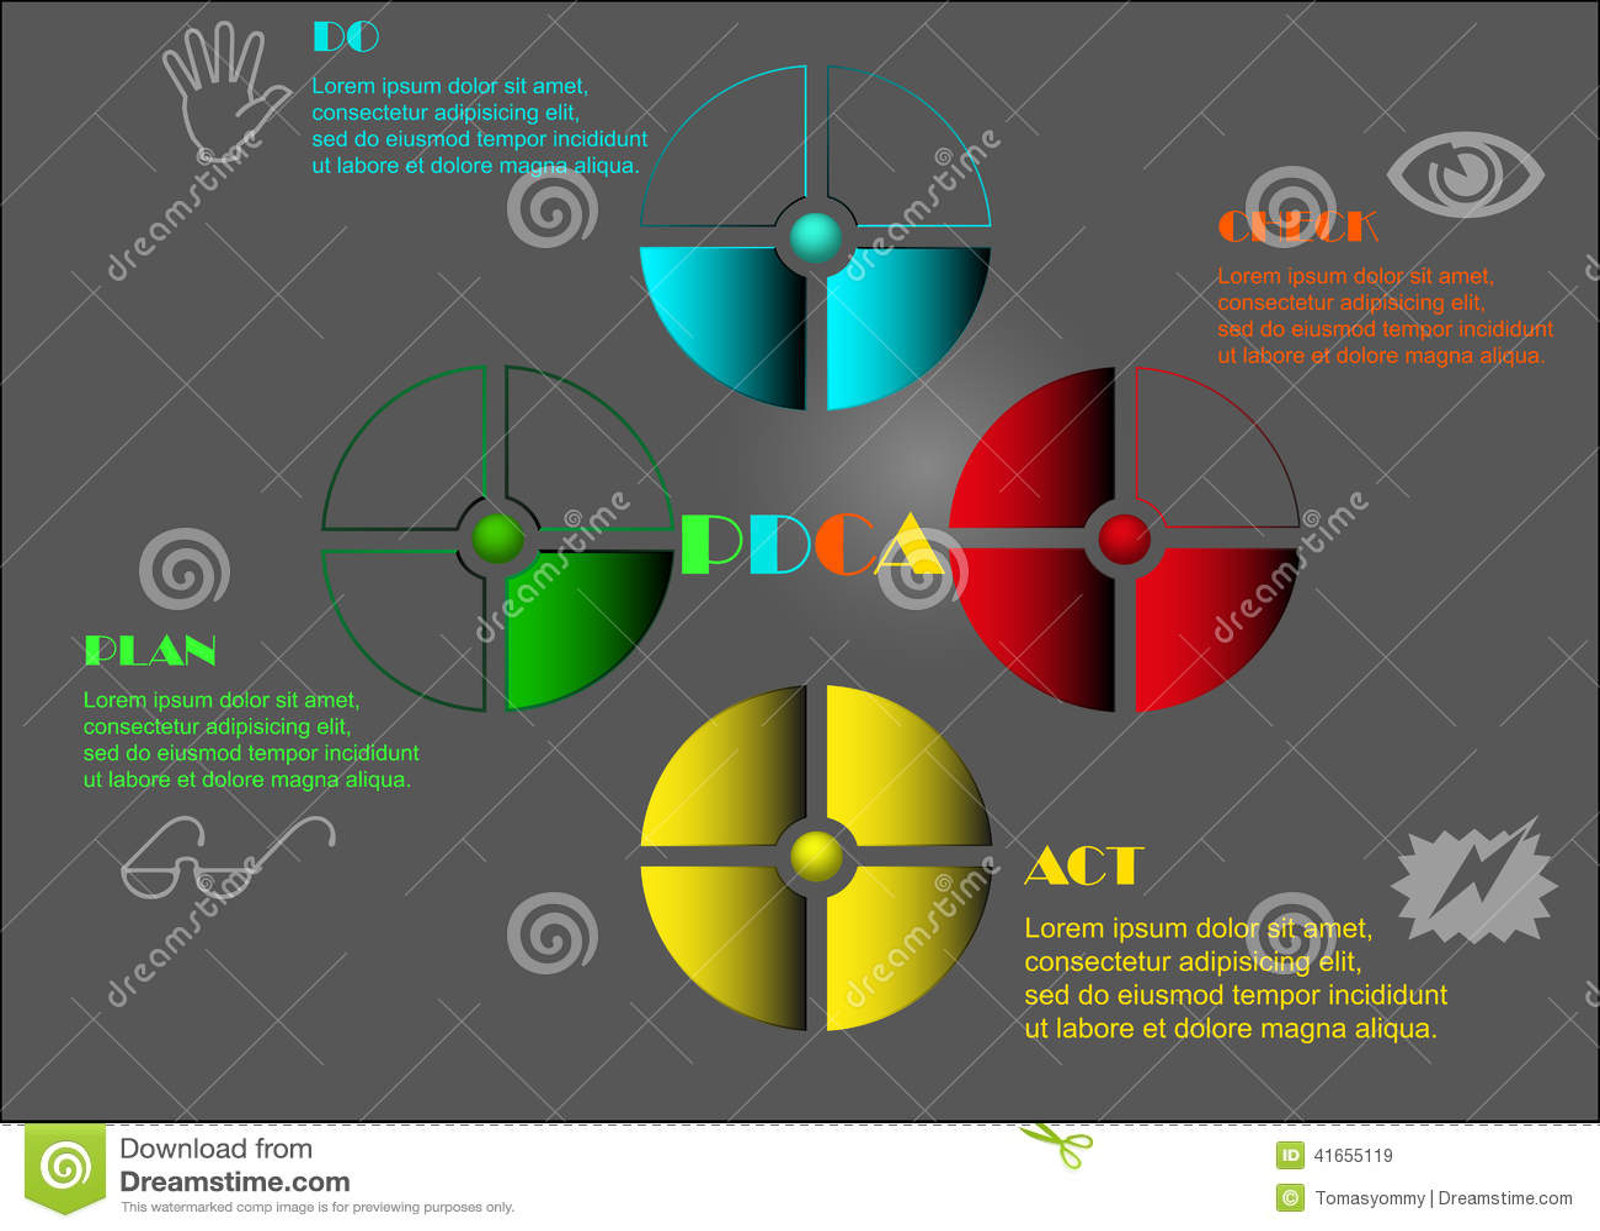 pdca cycle diagram yamaha moto 4 200 wiring diagrams stock vector image 41655119